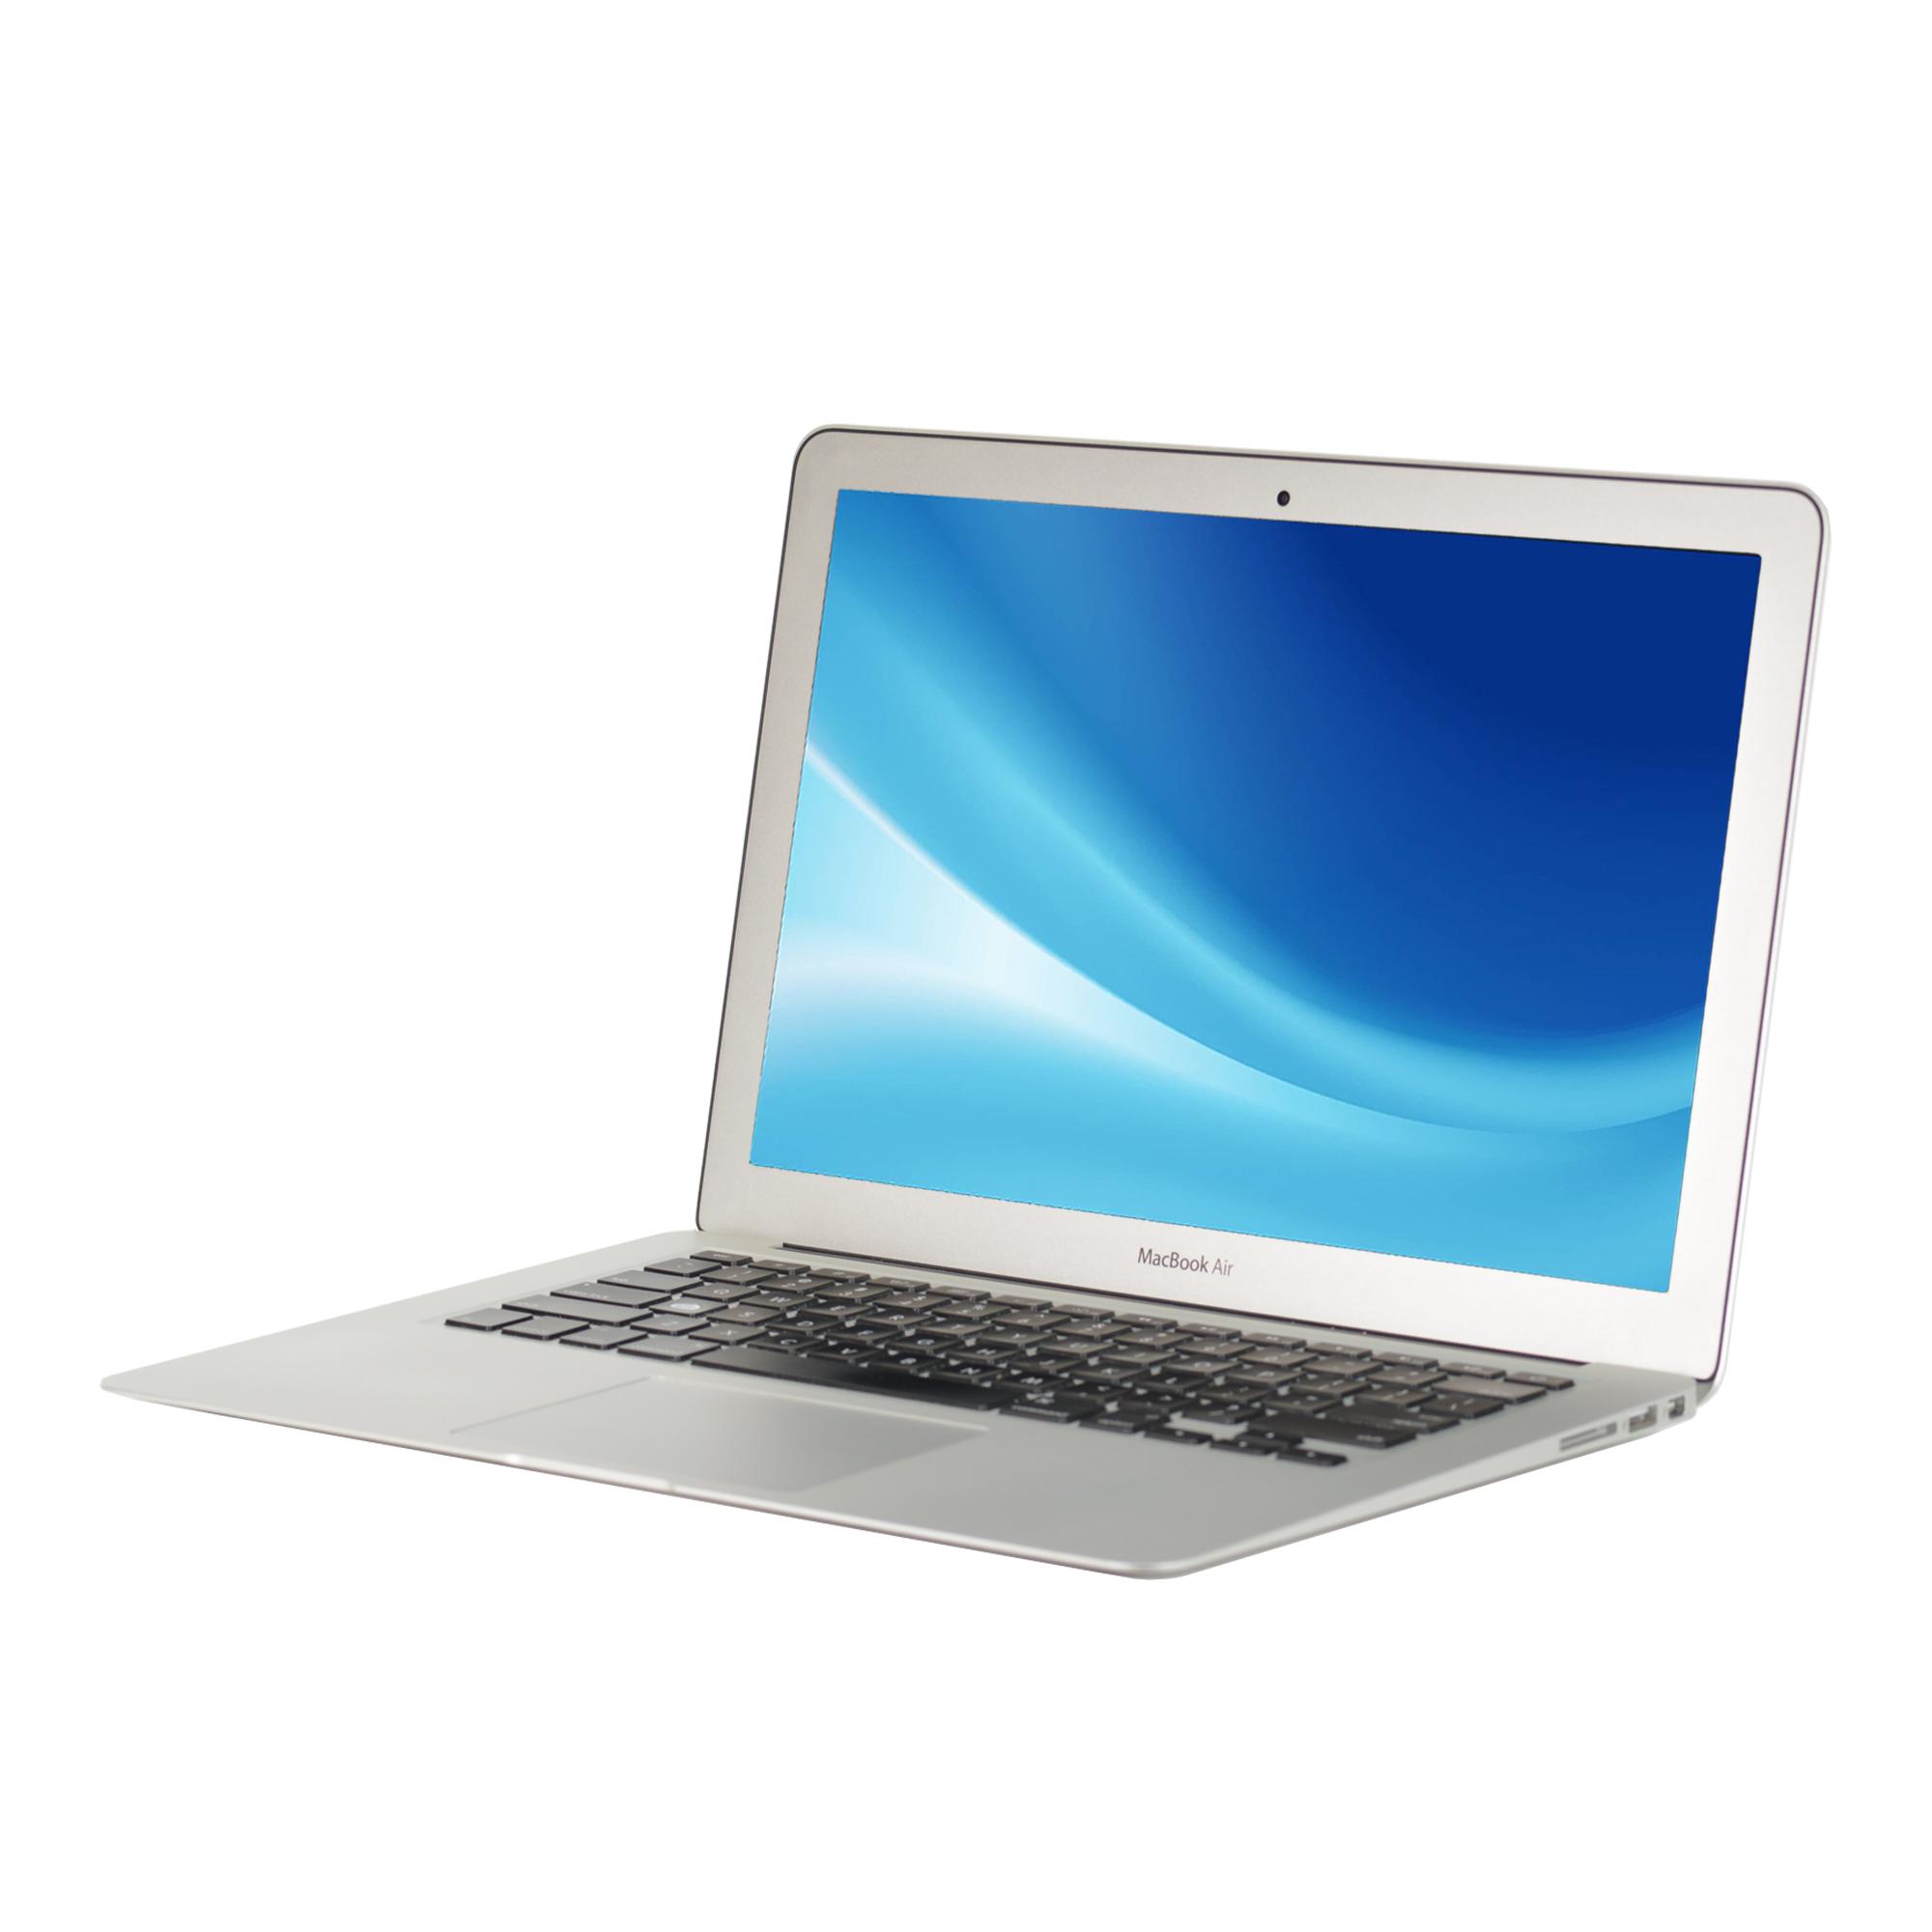 apple 13 3 macbook air md761ll b core i5 1 4ghz 4gb ram 256gb ssd tanga. Black Bedroom Furniture Sets. Home Design Ideas